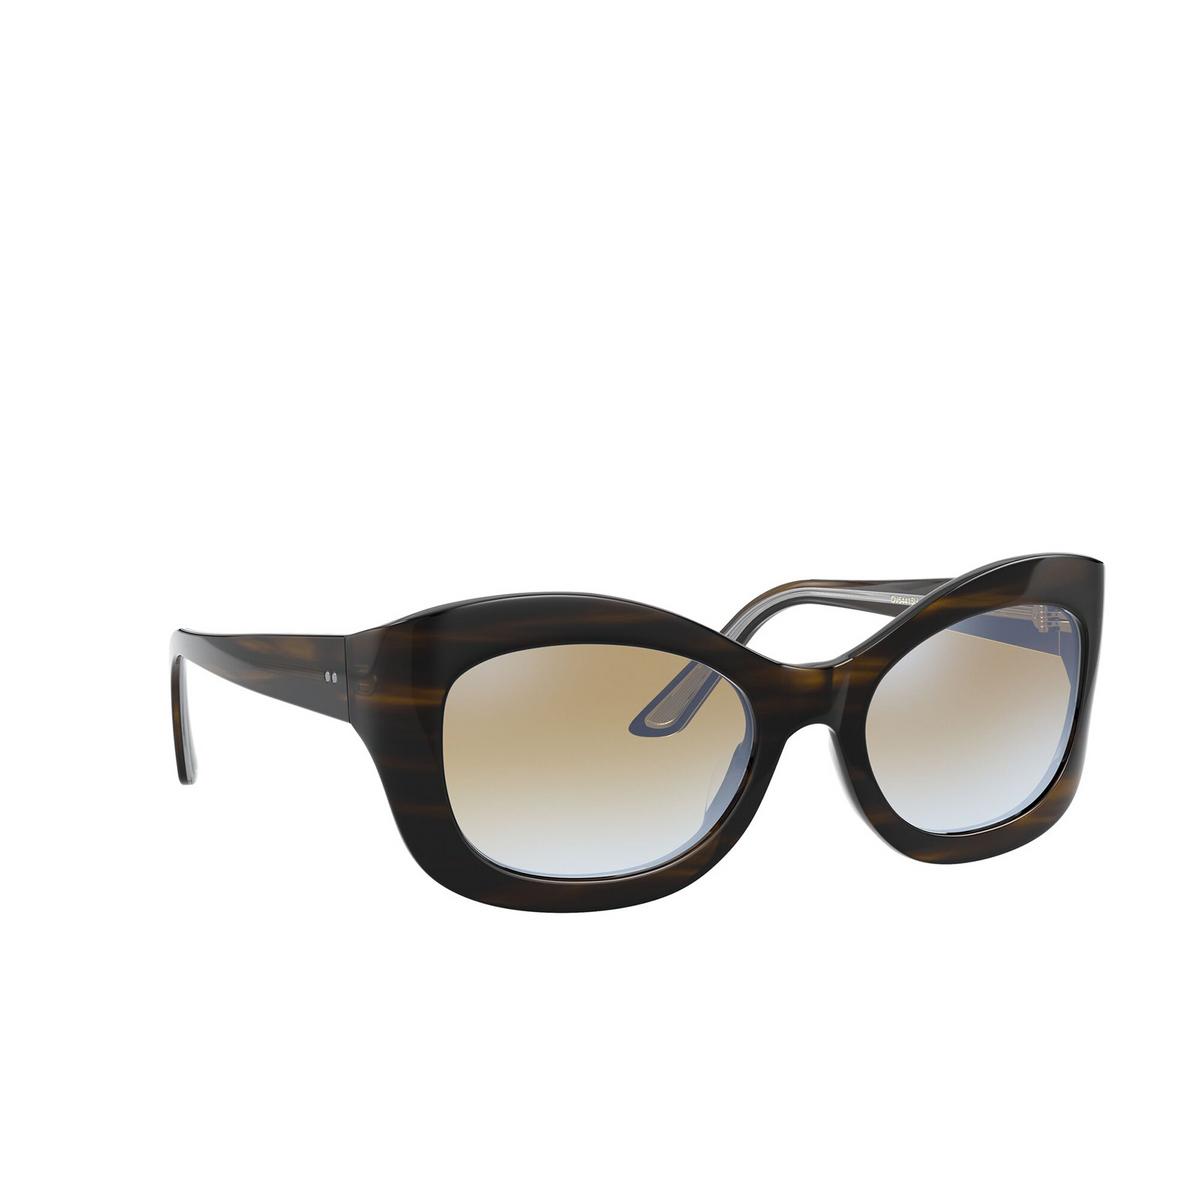 Oliver Peoples® Butterfly Sunglasses: Edina OV5441SU color Bark 1677K6 - three-quarters view.